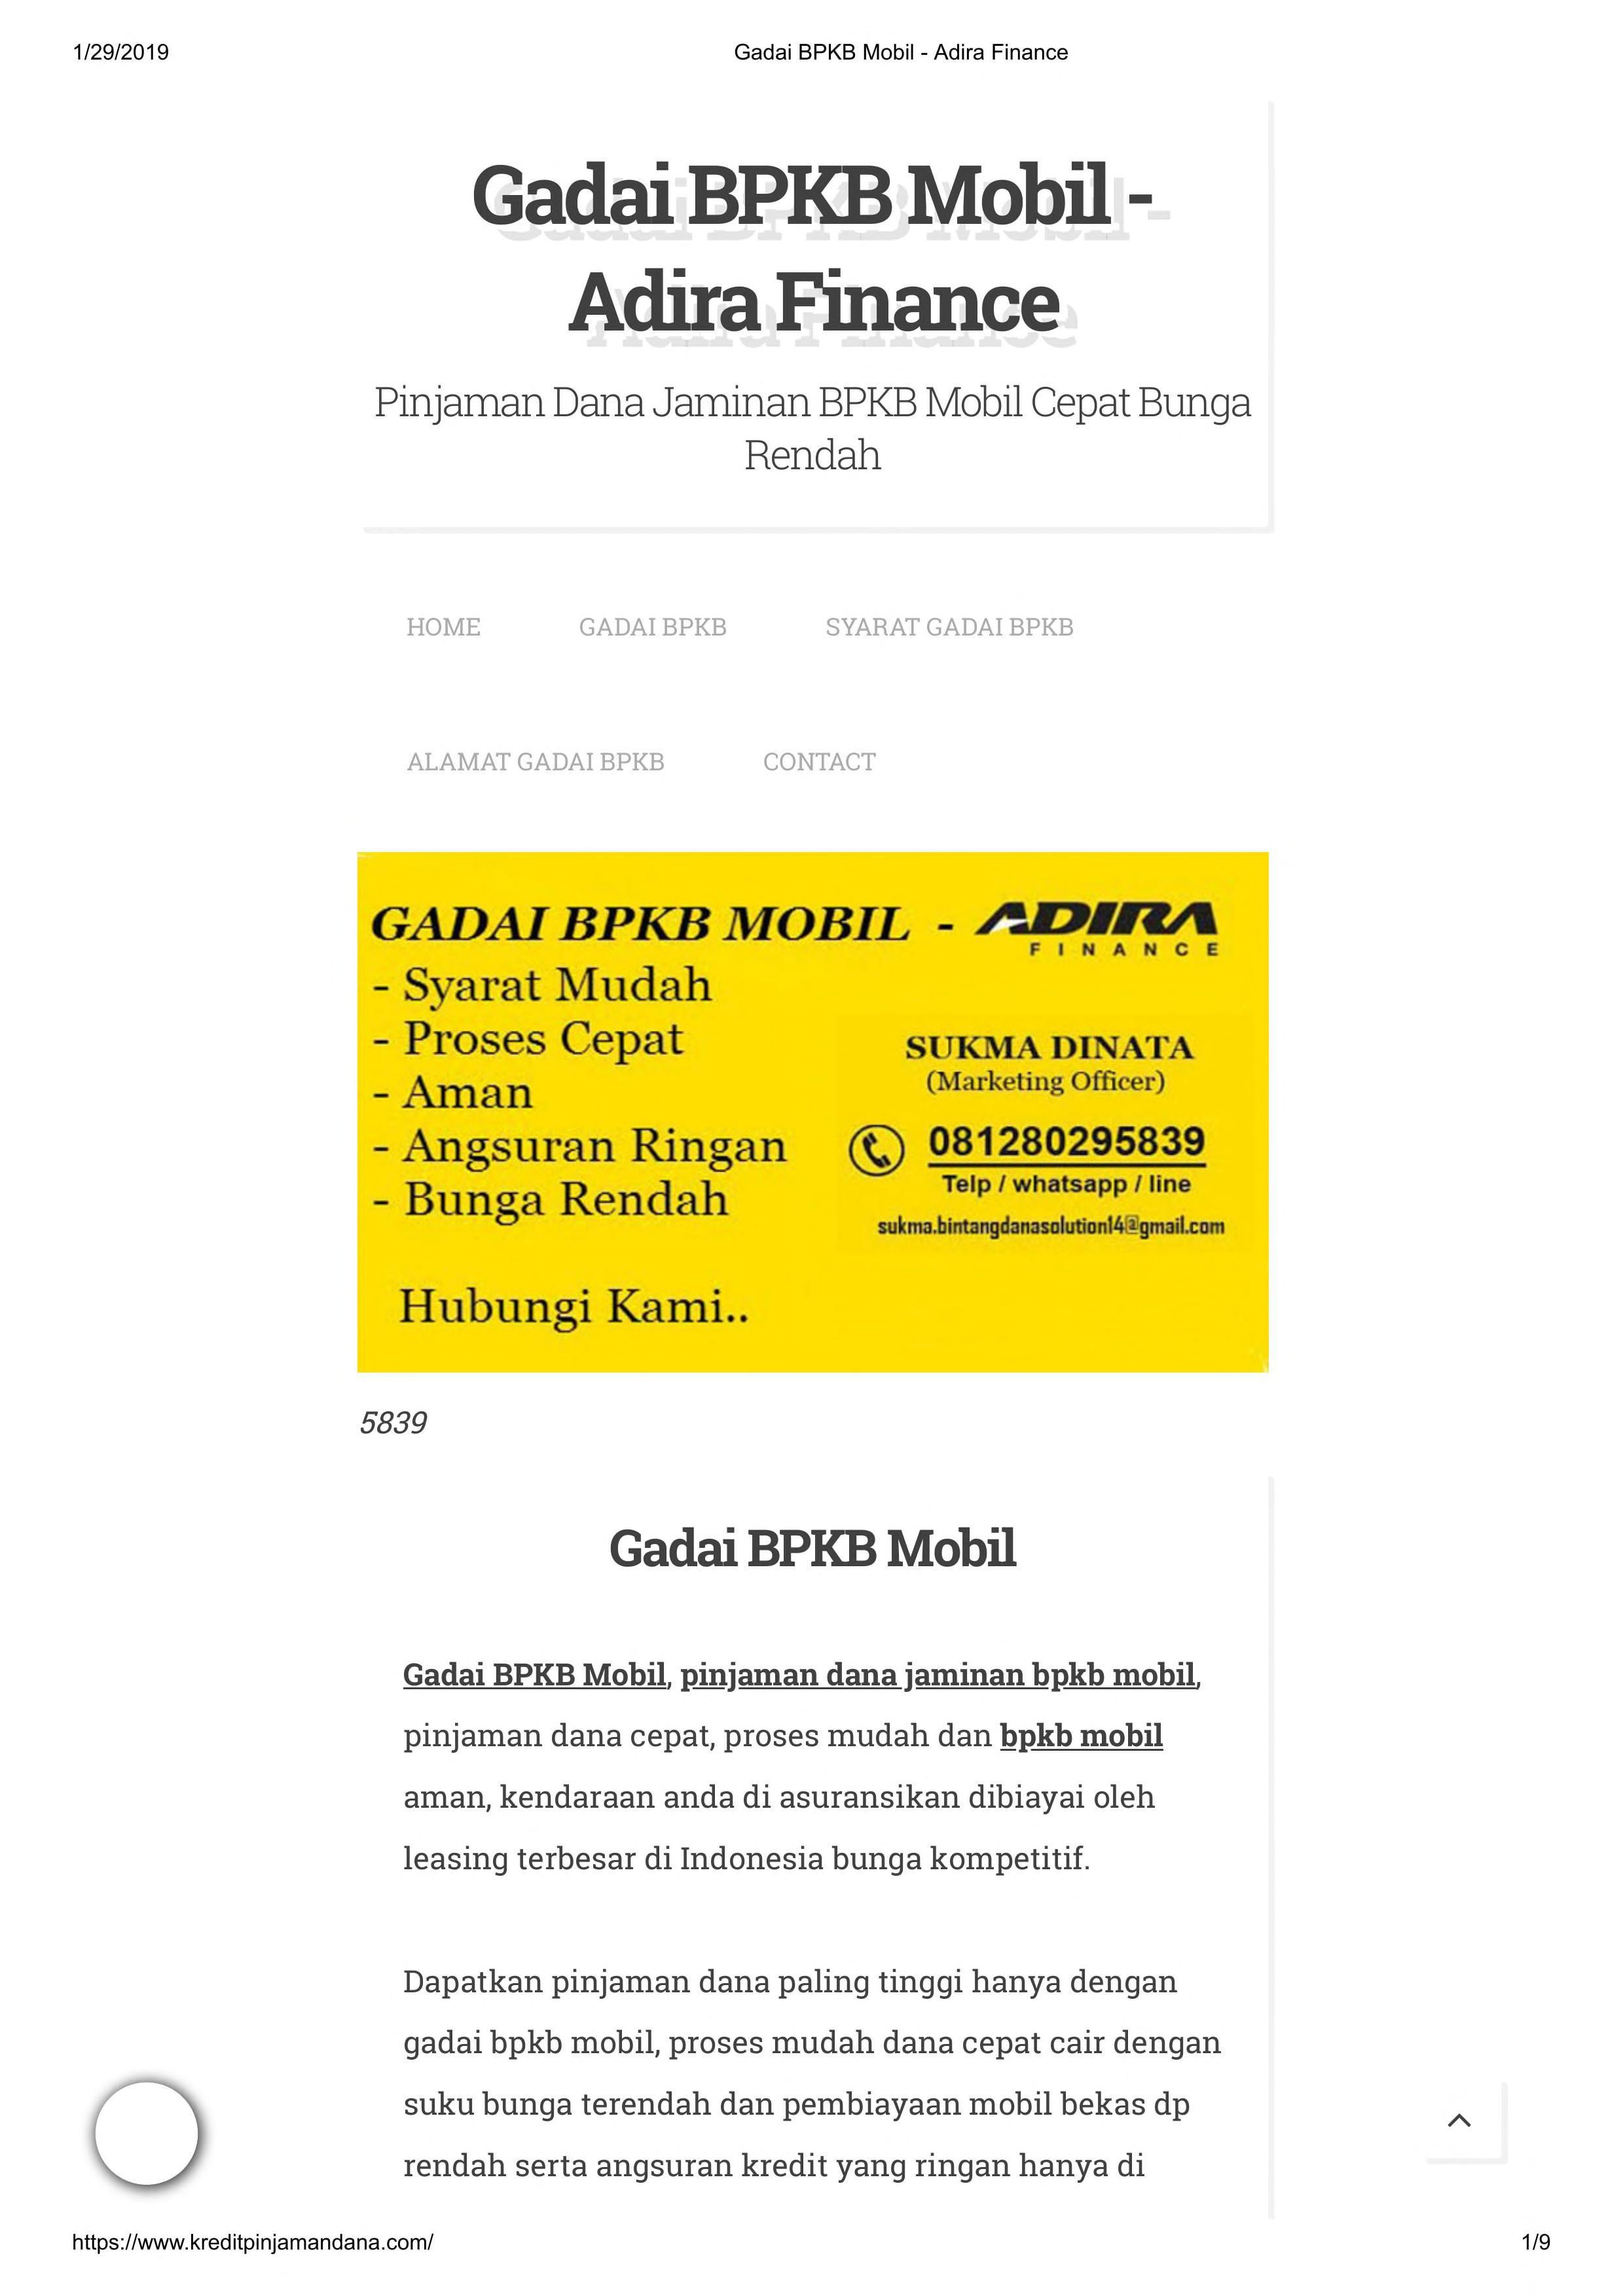 Gadai Bpkb Mobil Adira Finance Free Download Borrow And Streaming Internet Archive Finance Search Marketing The Borrowers